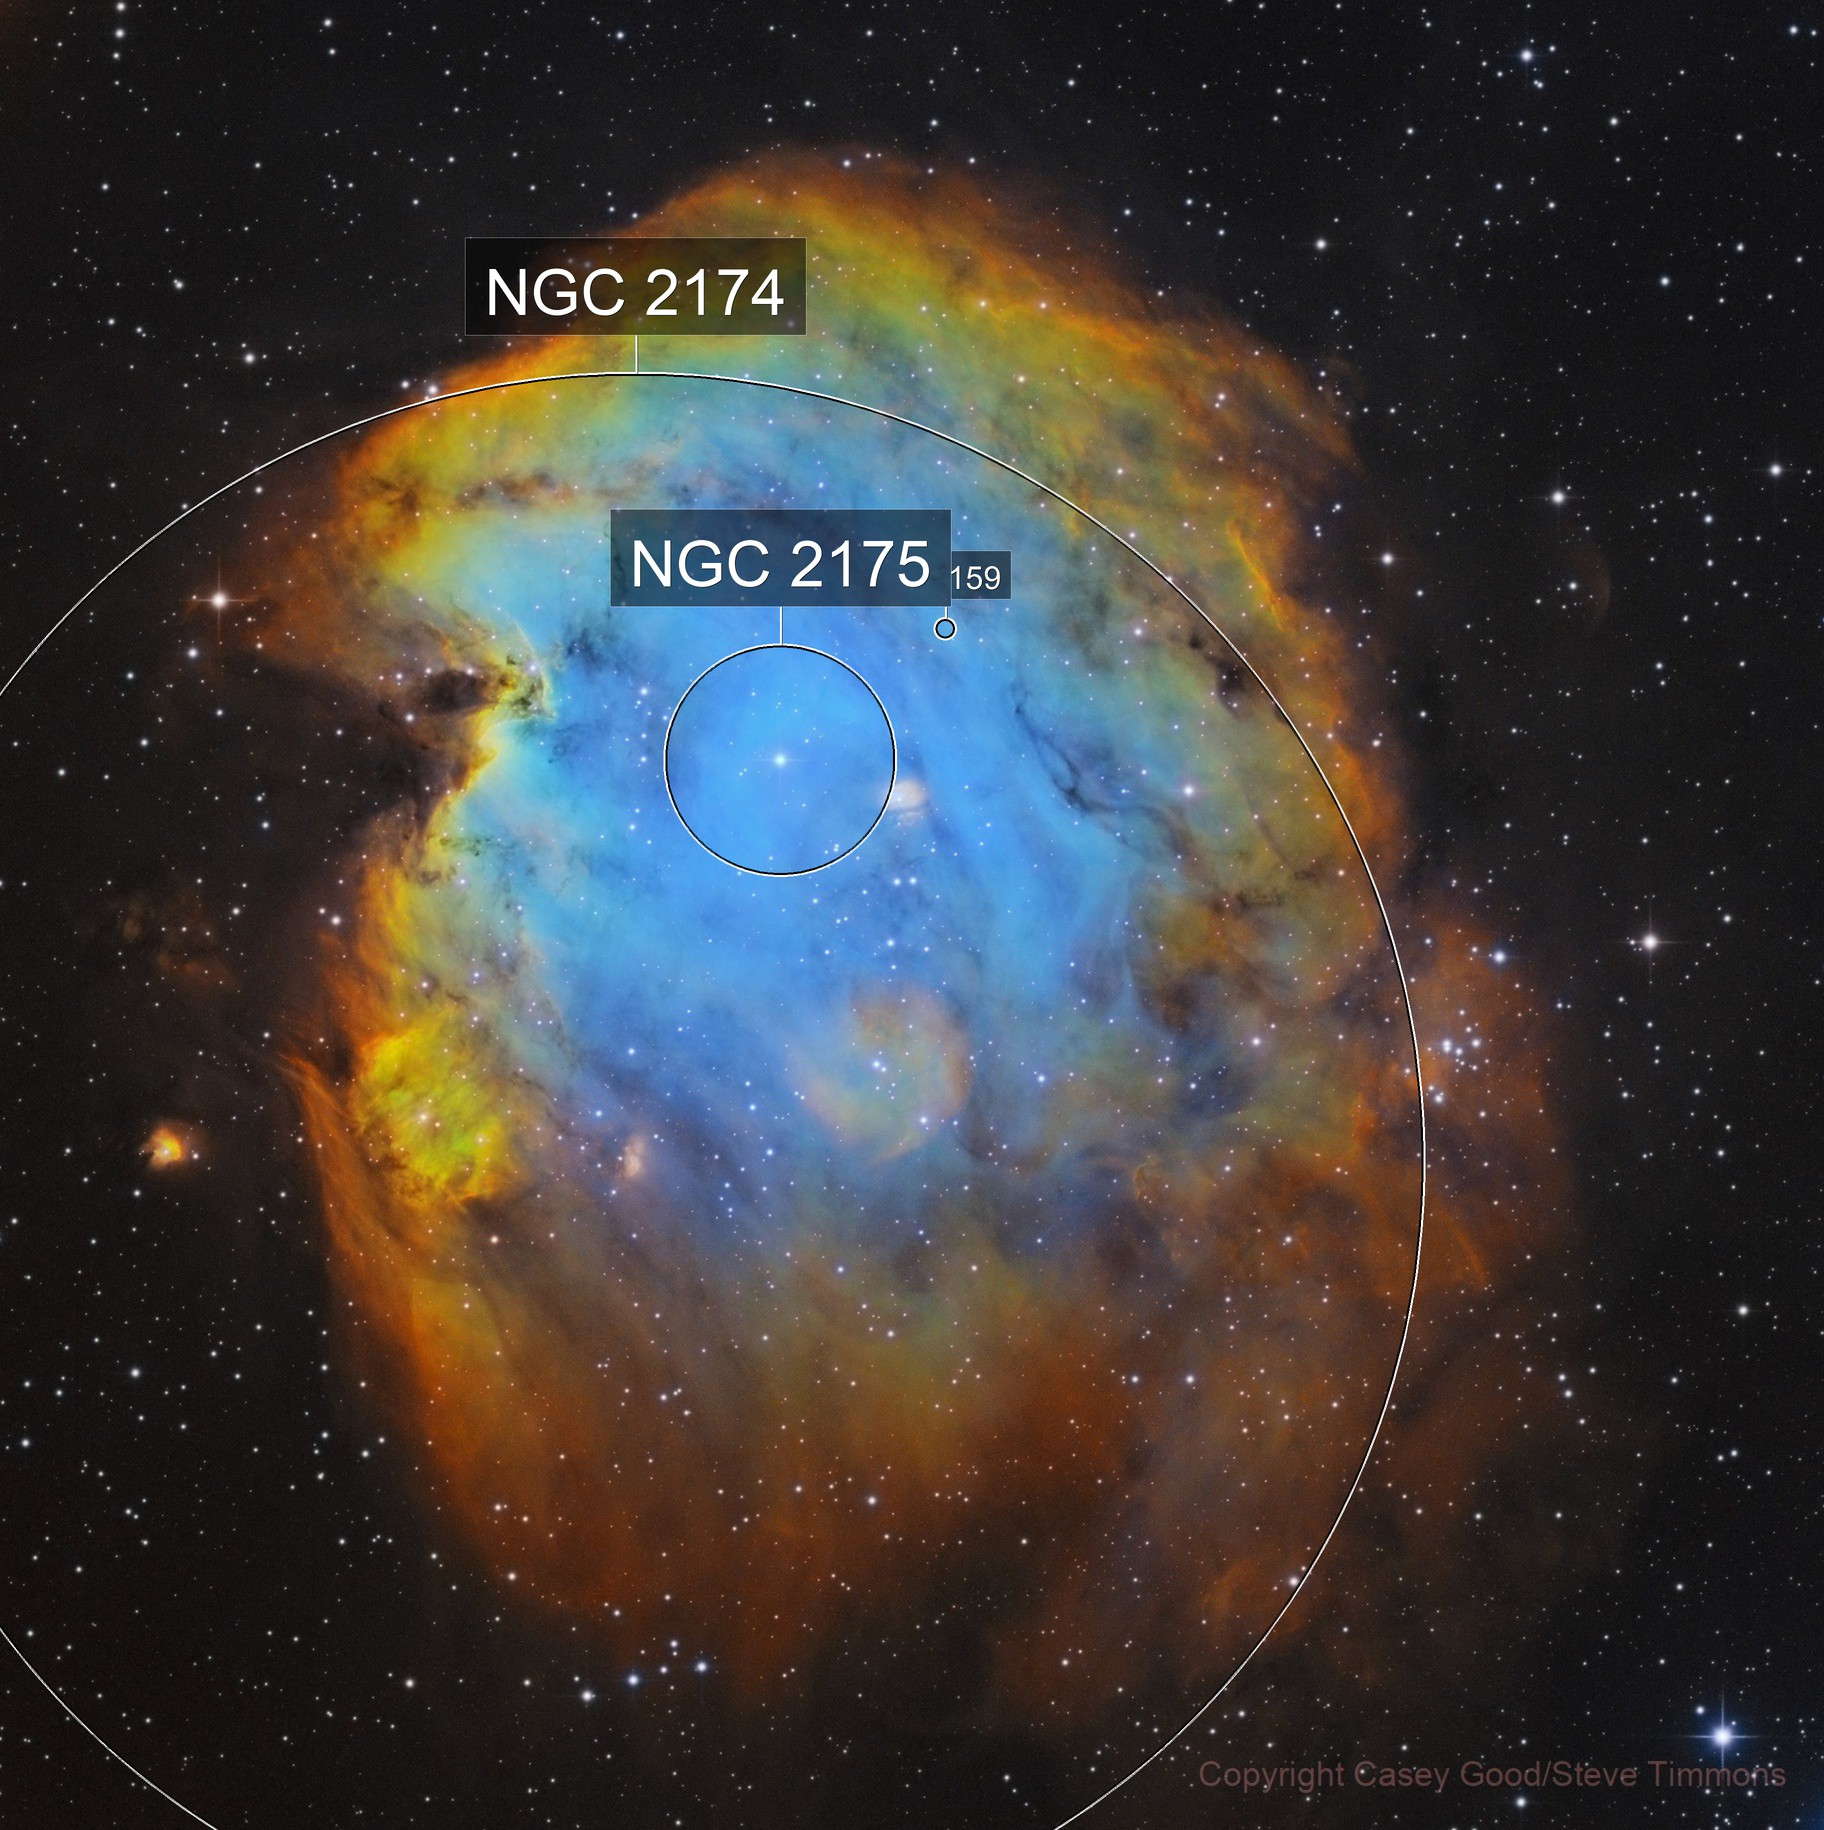 NGC 2174 - The Monkey's Head